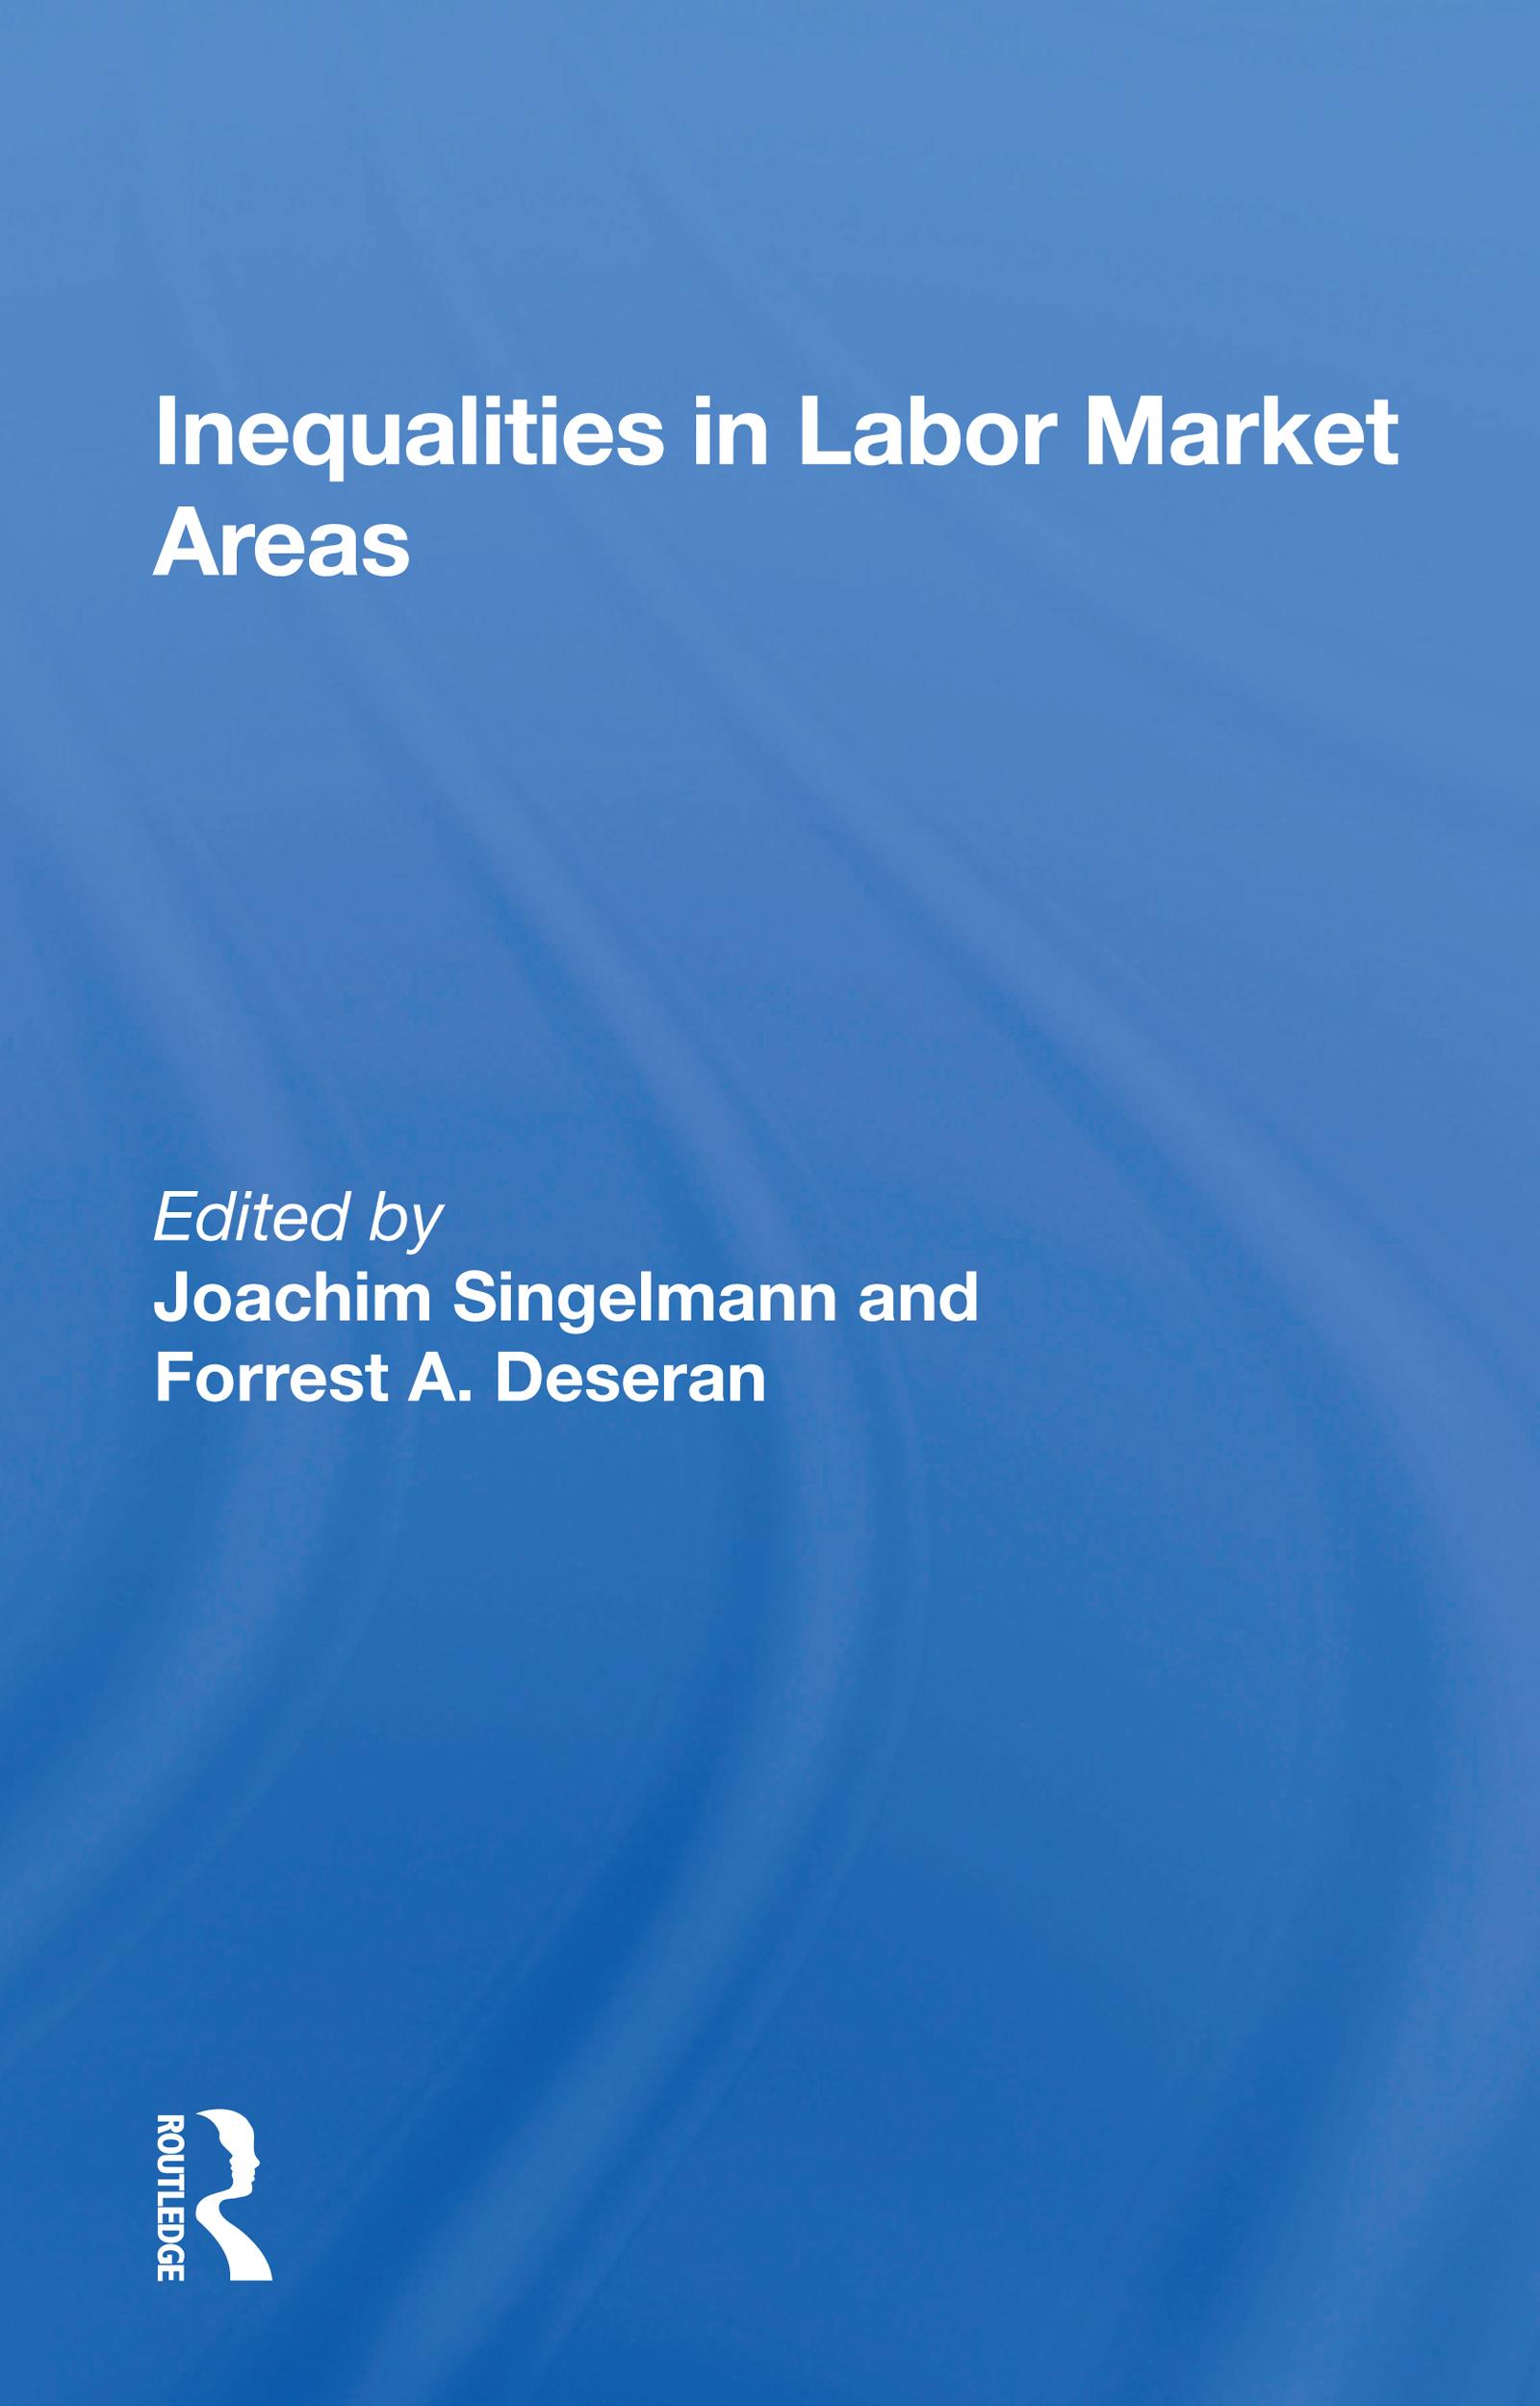 Inequalities in Labor Market Areas